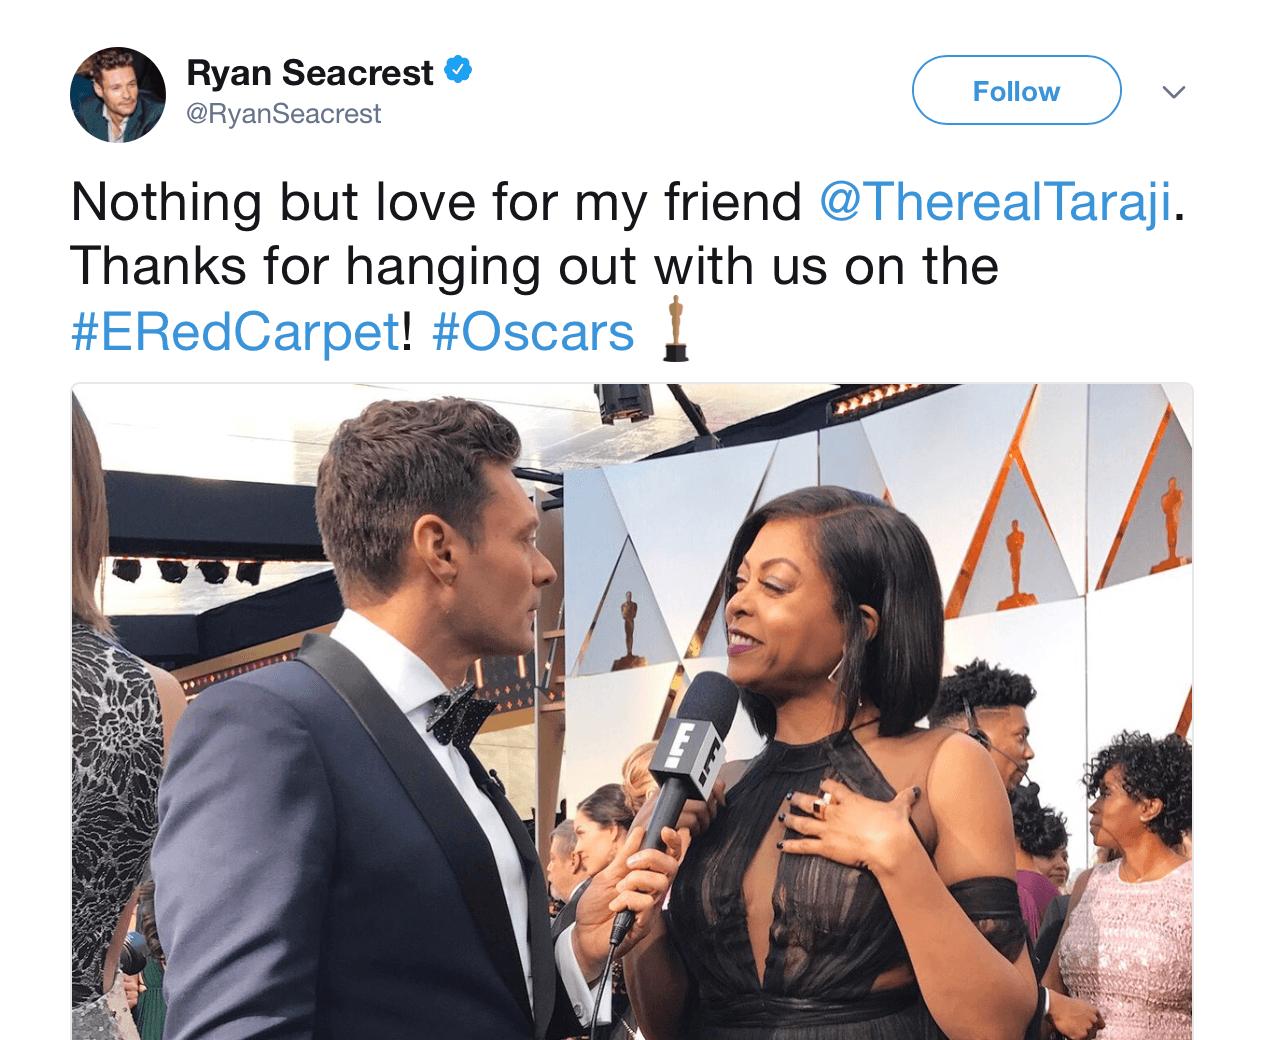 A screenshot of Ryan Seacrest's tweet